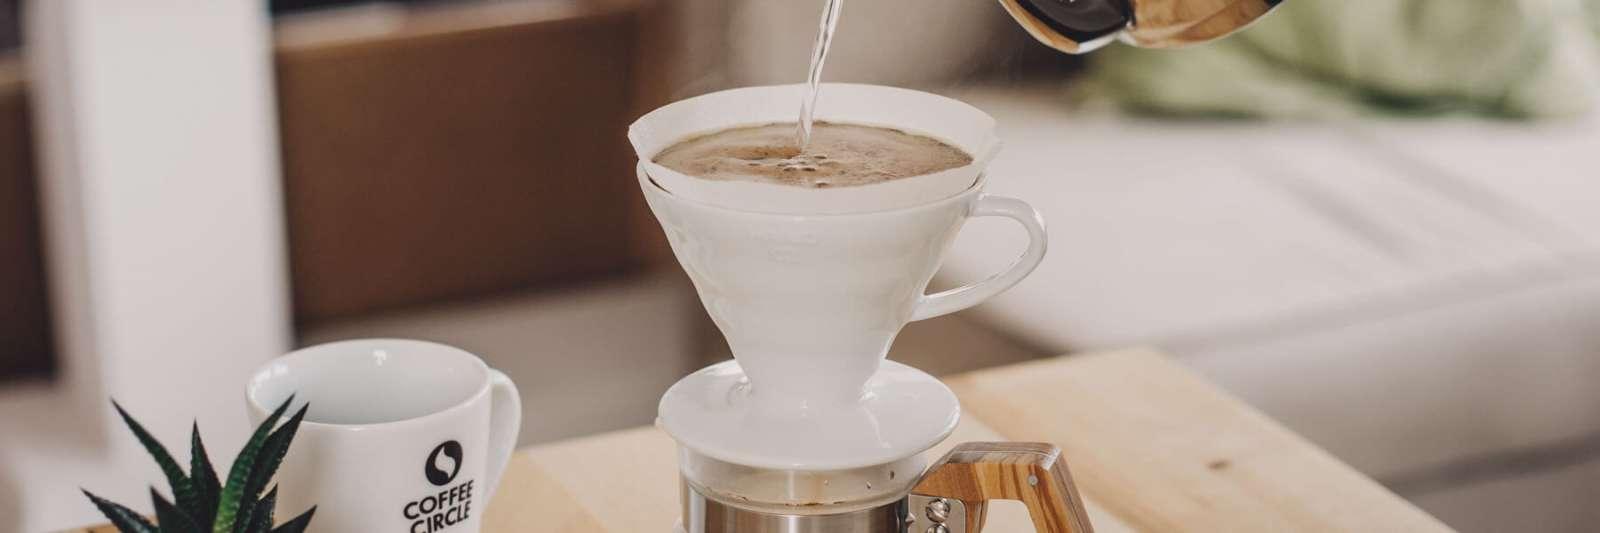 Kaffeezubehör